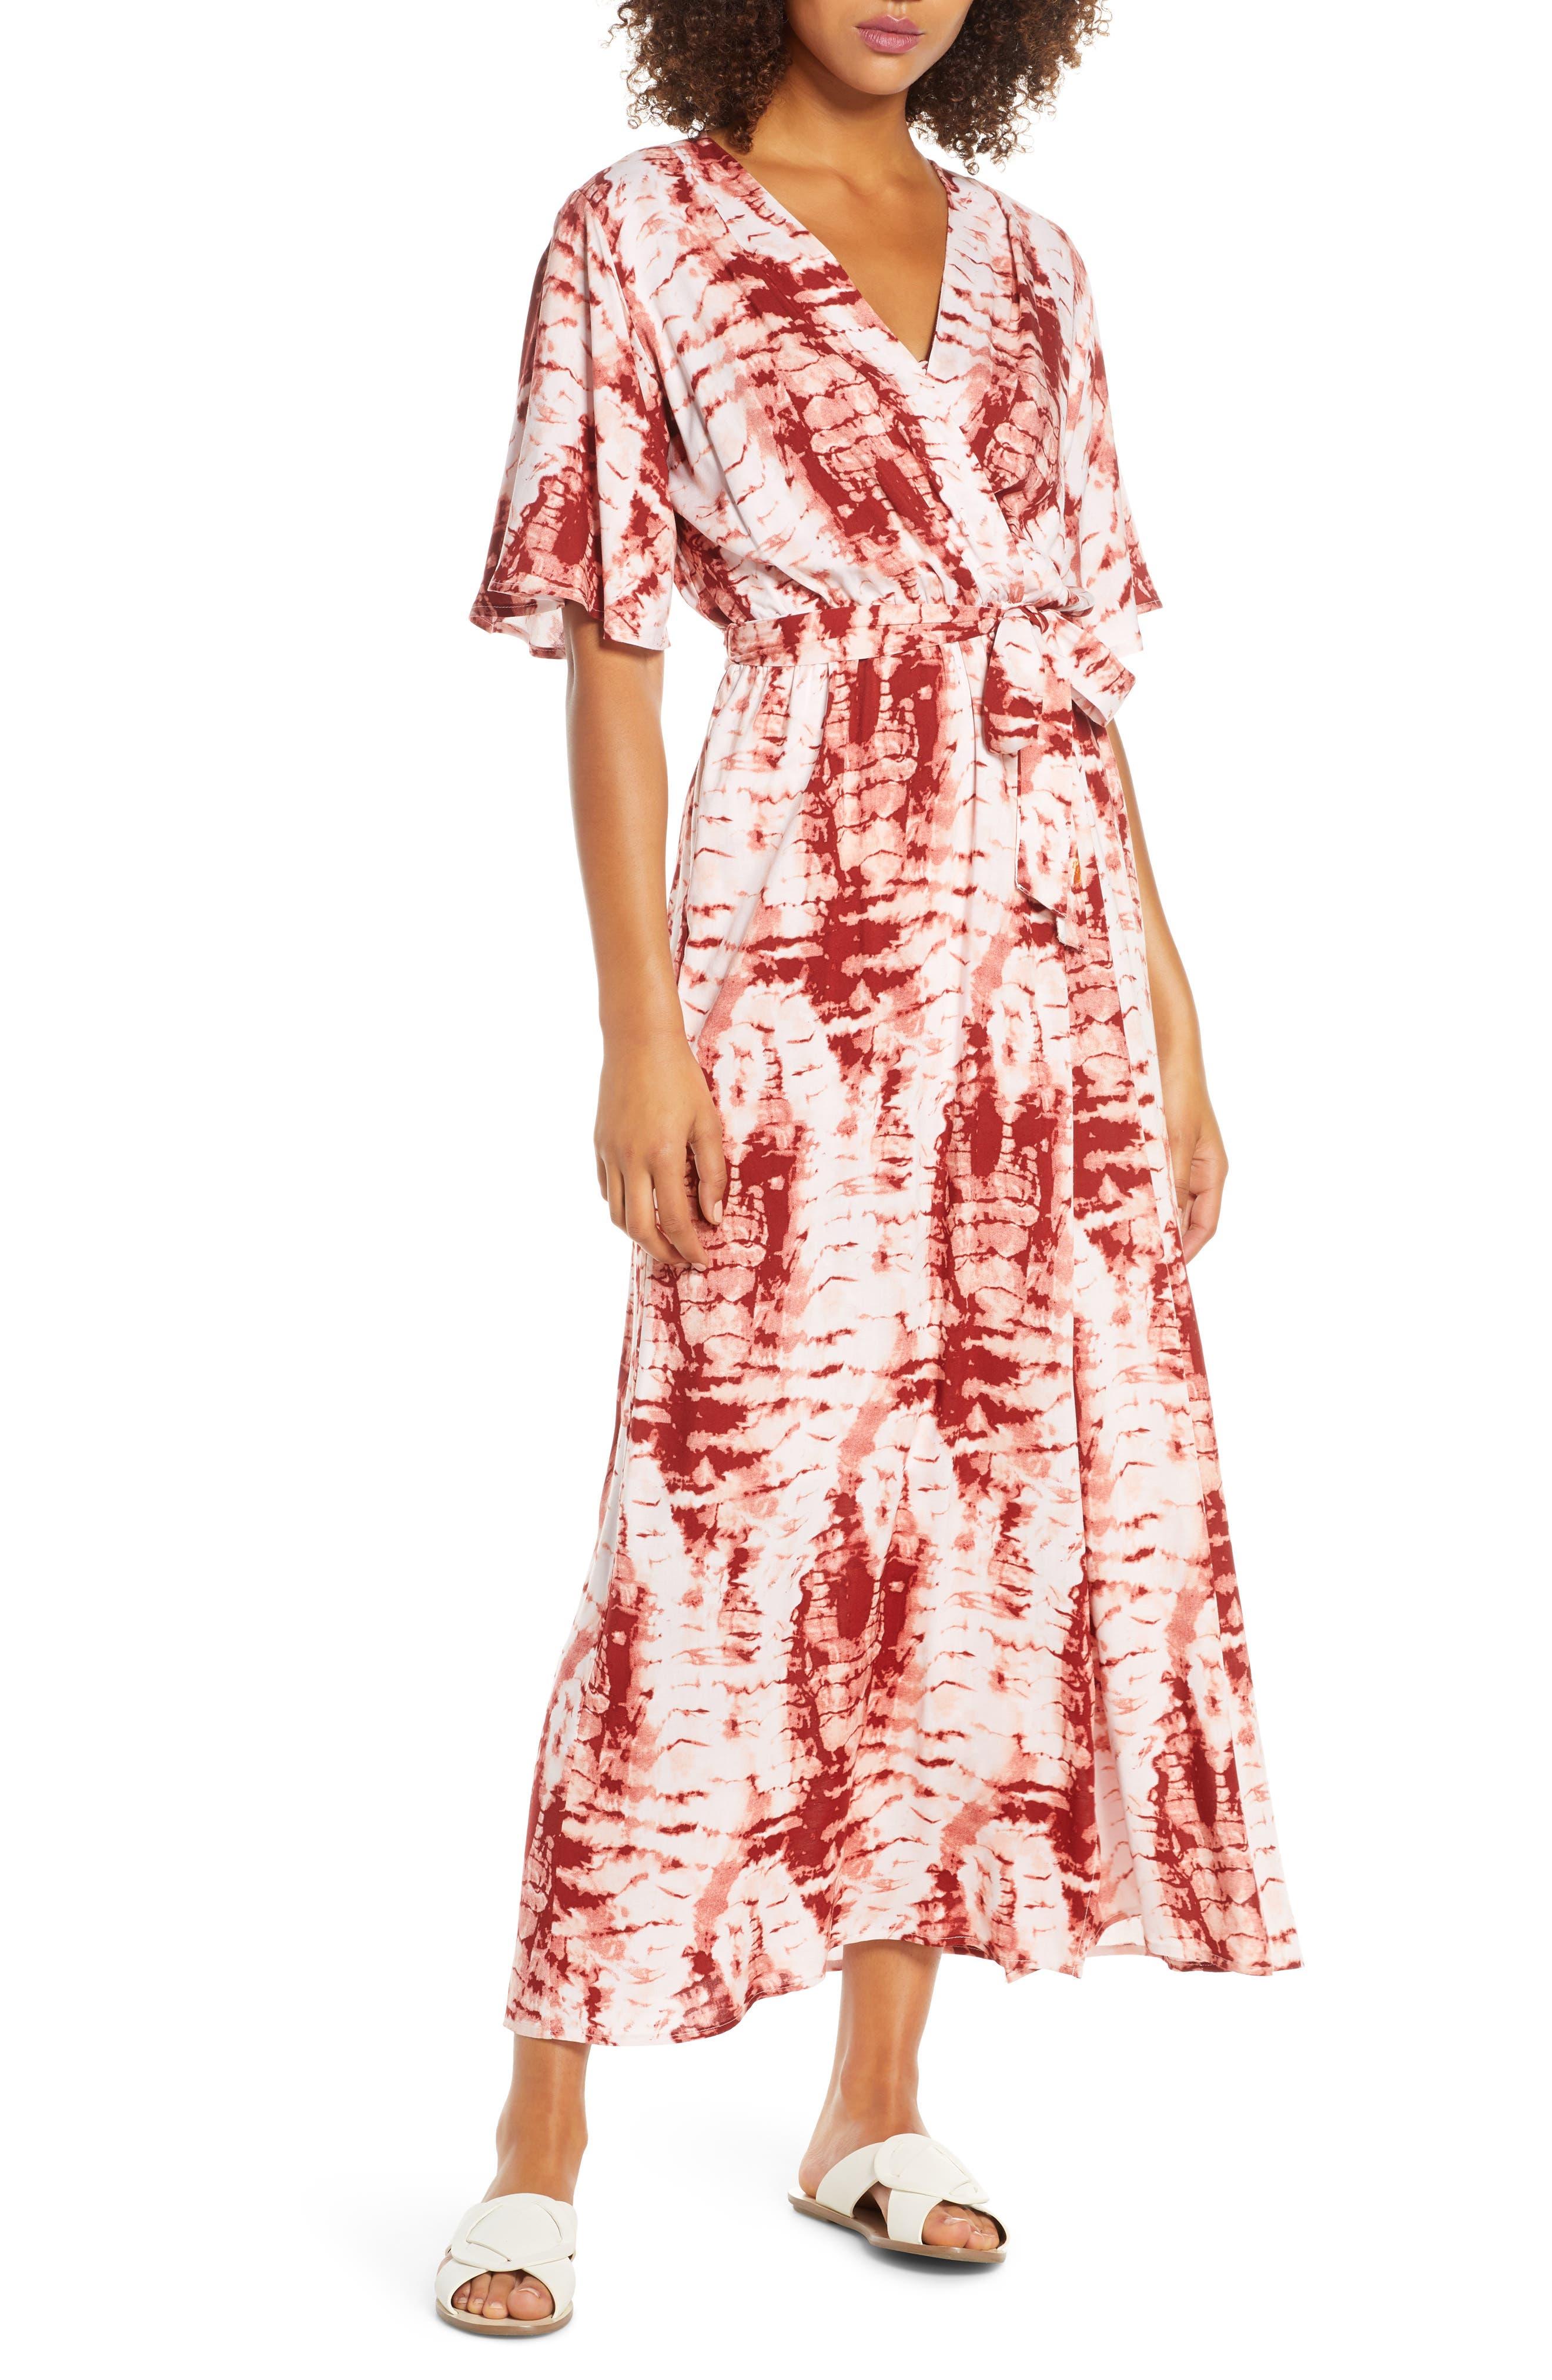 Fraiche by J Womens Tie Dye Cami Maxi Dress